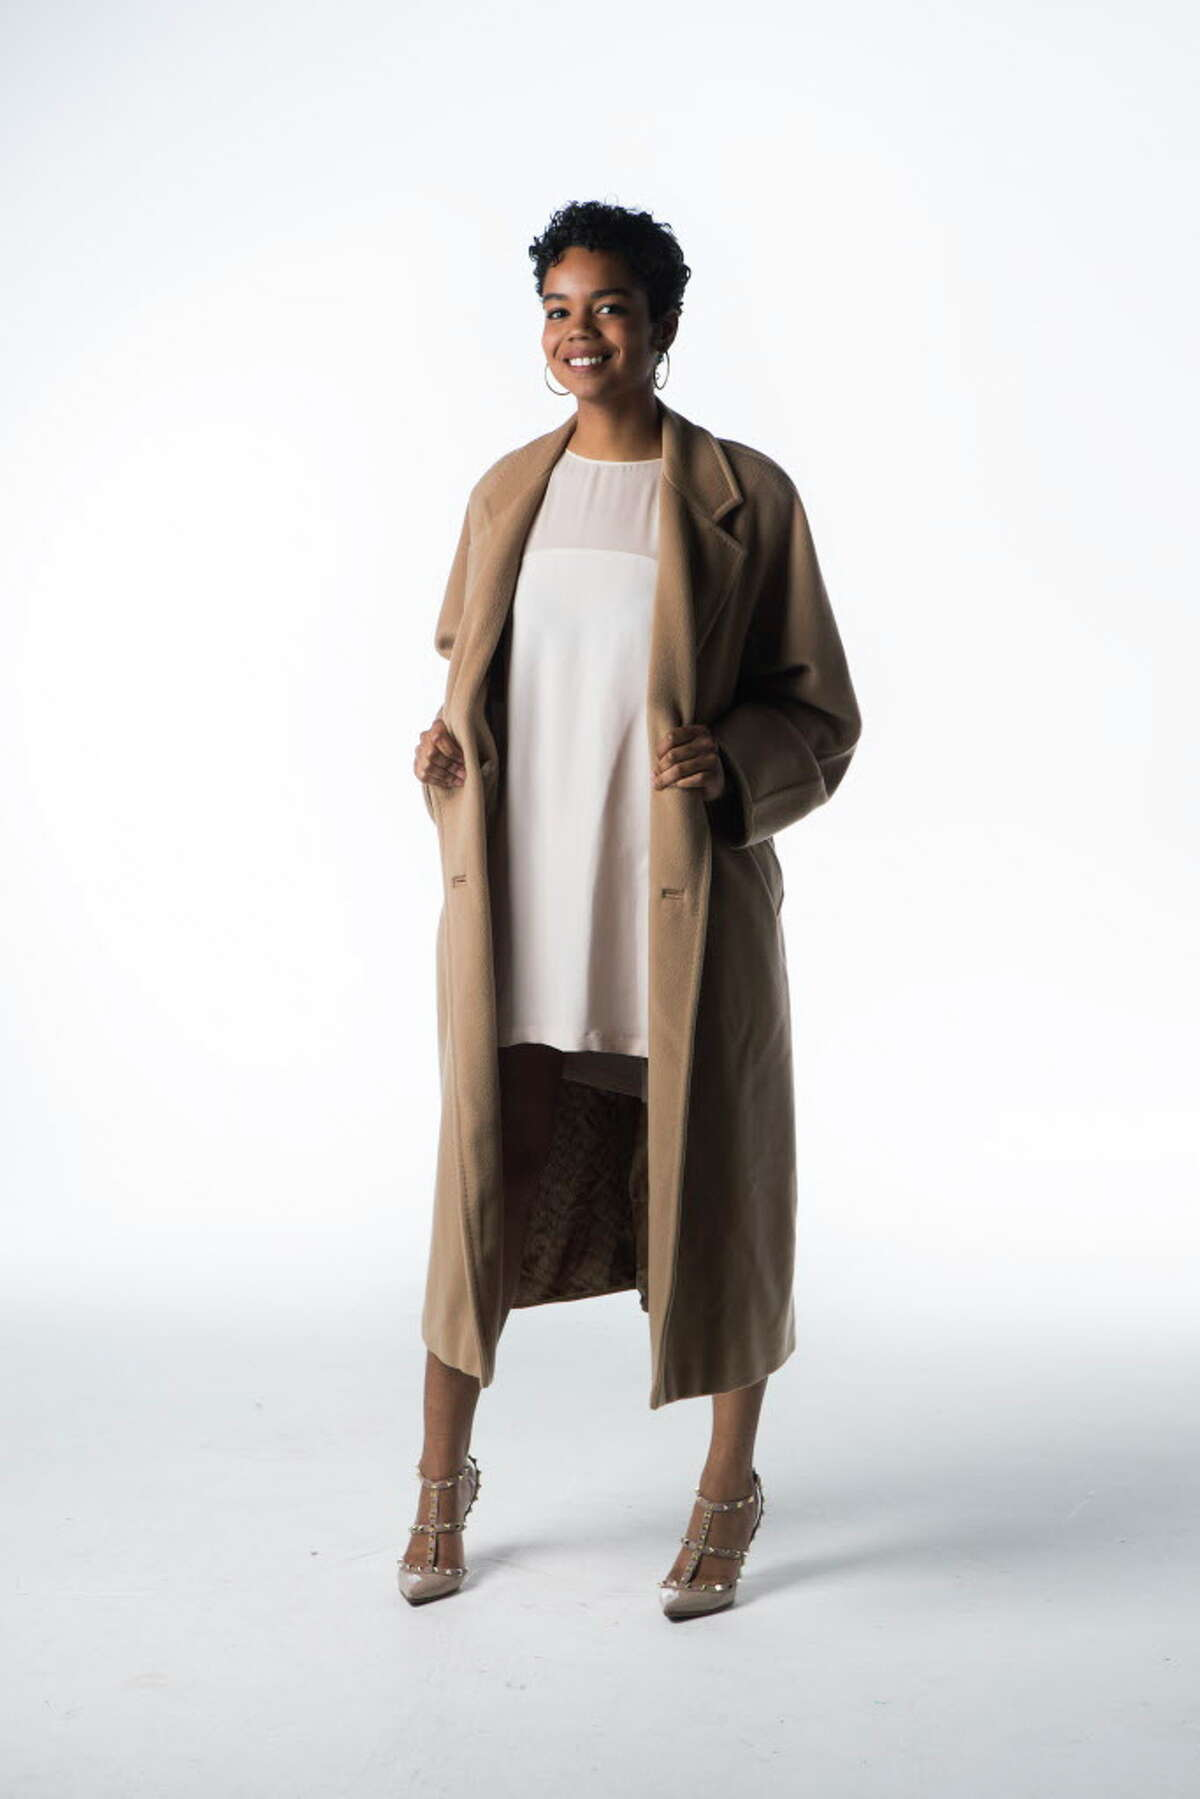 Jailyn Marcel models Max Mara's iconic 101801 coat.